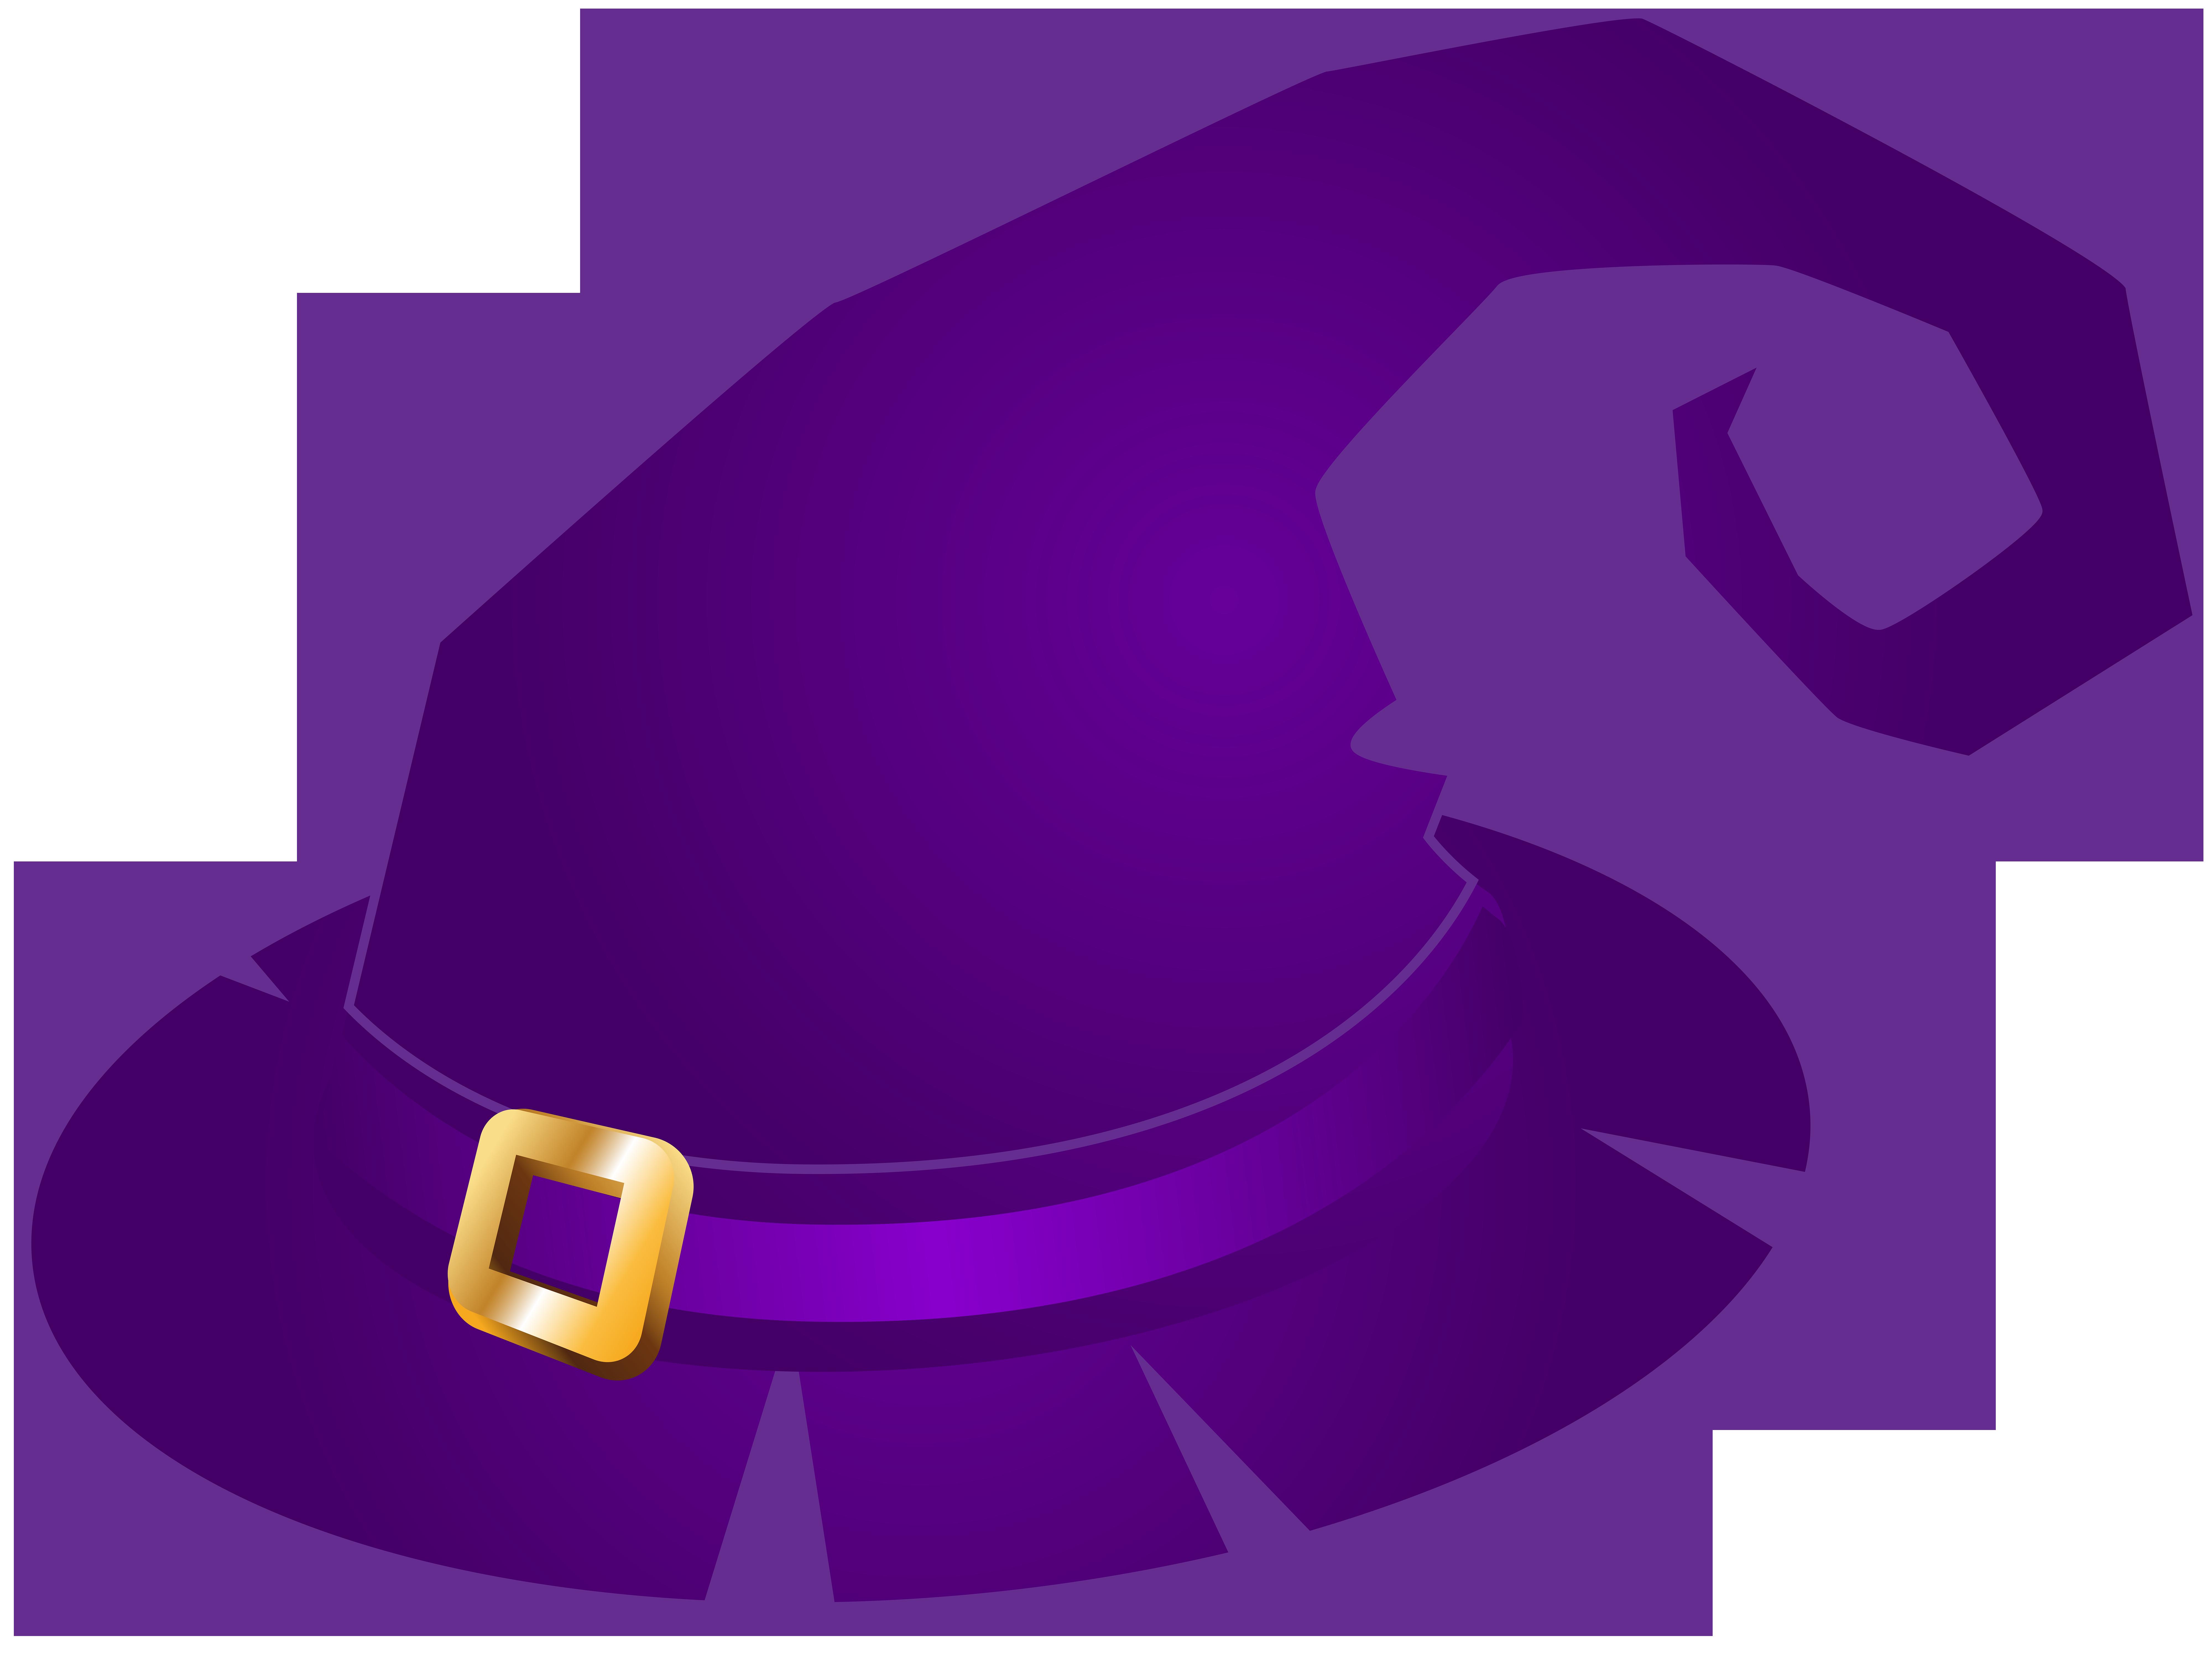 8000x5981 Purple Witch Hat Transparent Png Clip Art Imageu200b Gallery